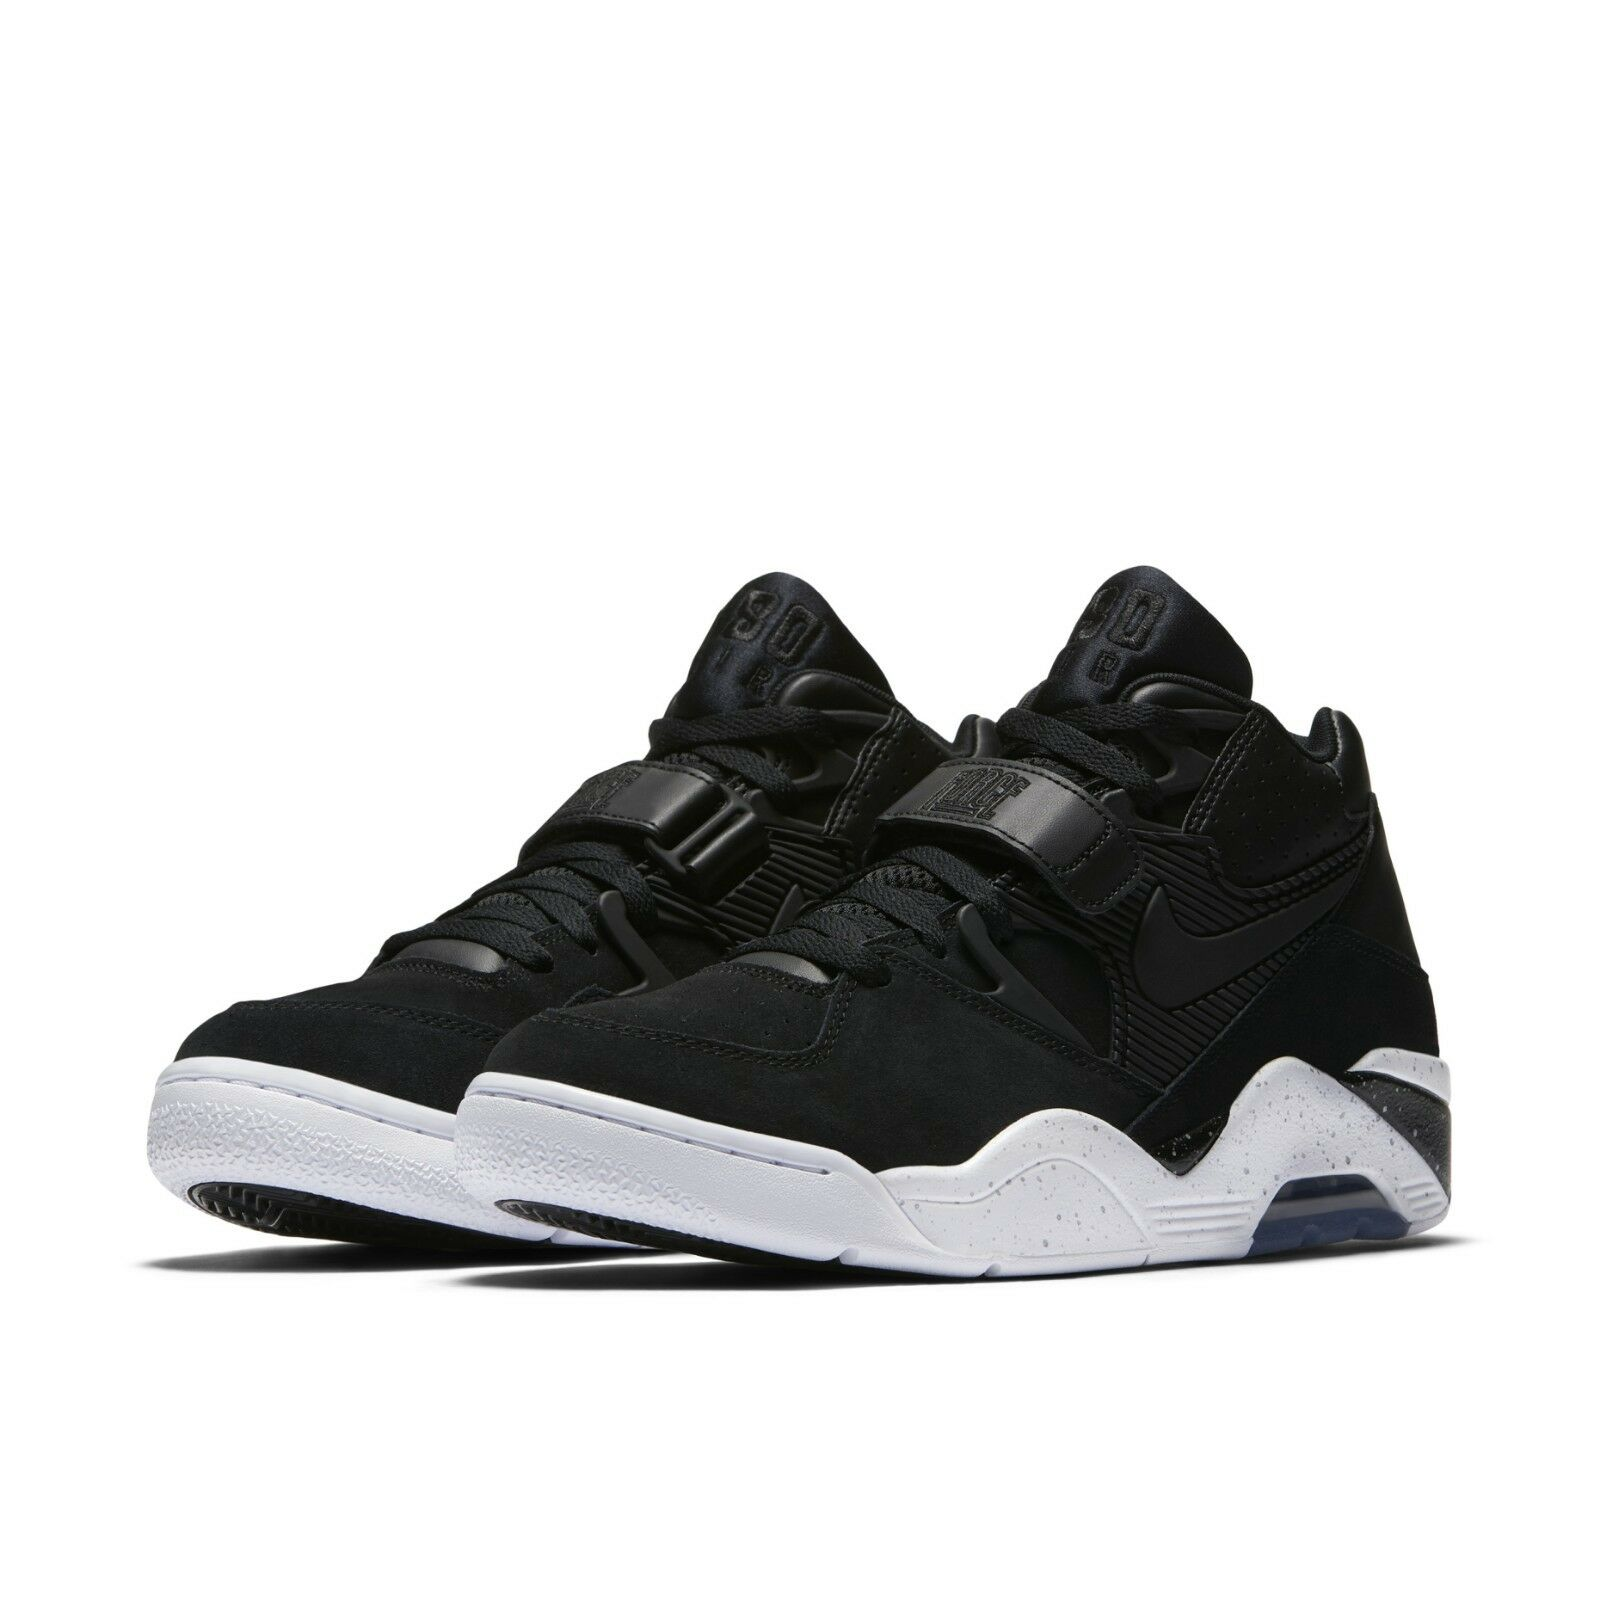 Nike air force 180 uomini e bianchi e uomini neri 310095-003 scarpe barkley scarpe casual 3b5f60